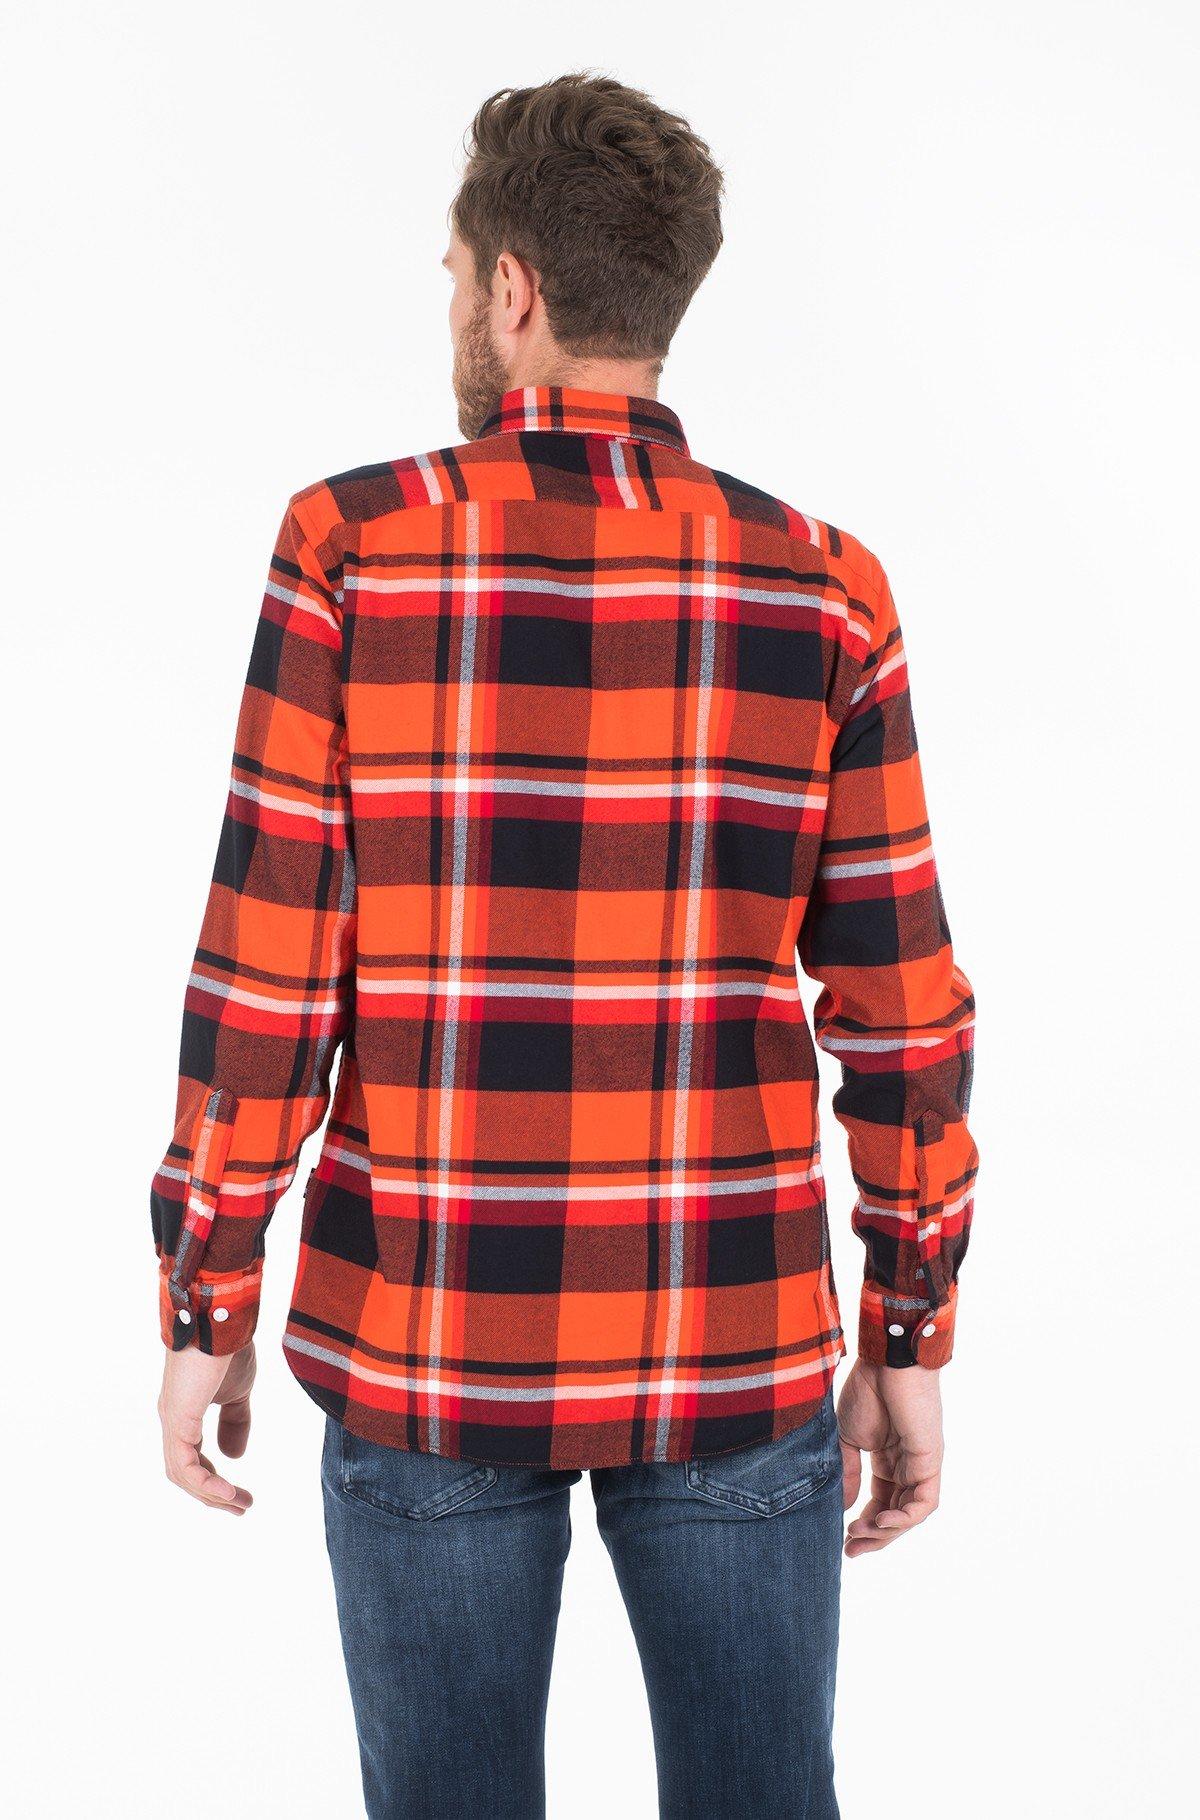 Marškiniai LH CHECK SHIRT-full-2